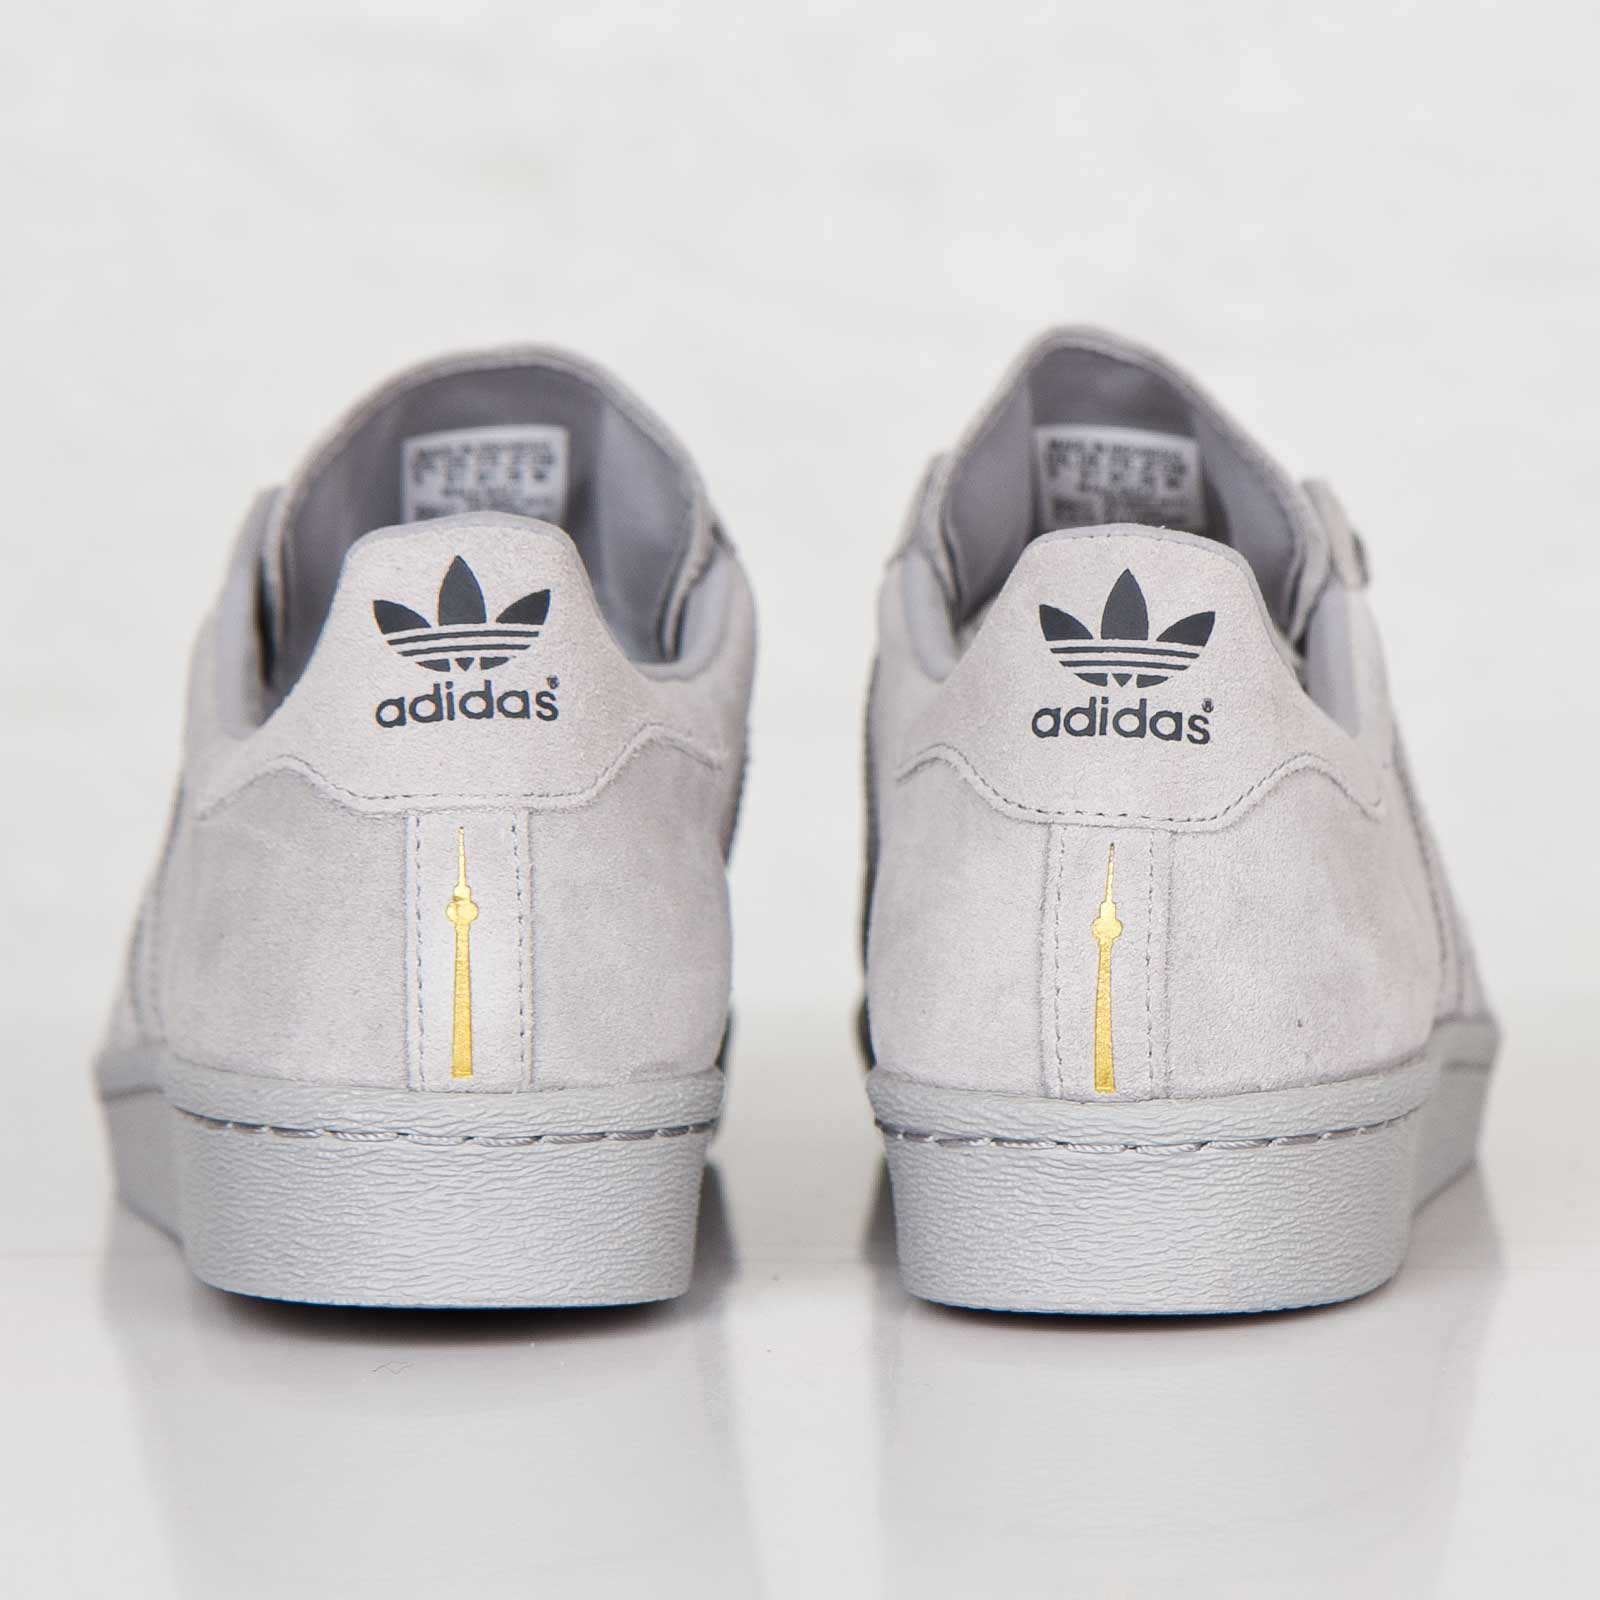 adidas superstar 80s city series berlin